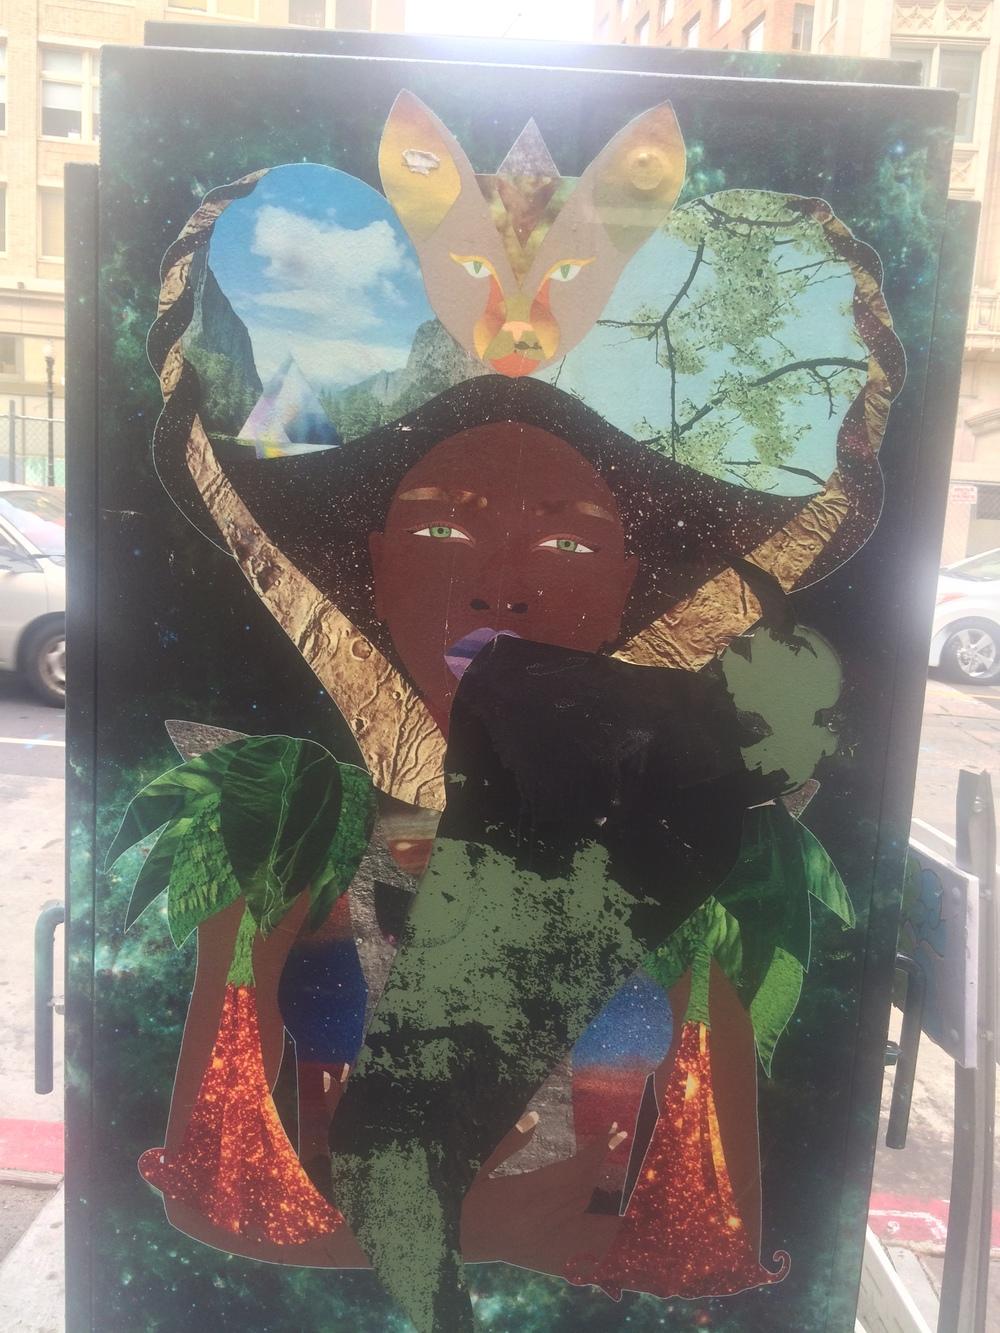 Mystic street art. Oakland, CA. August 2015.